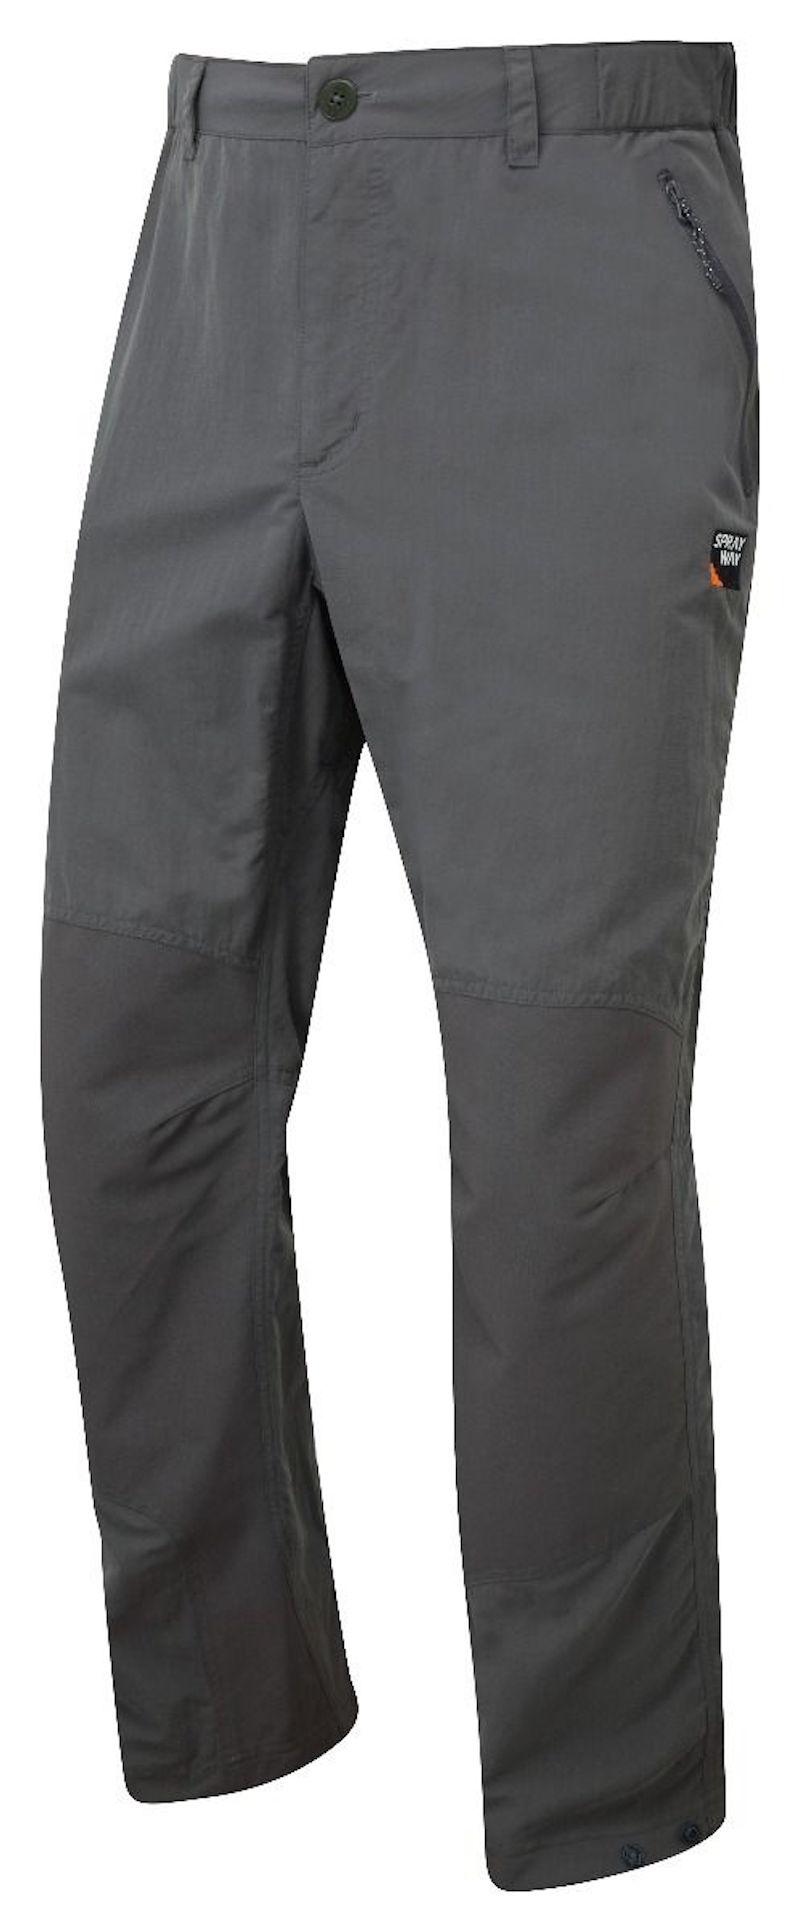 Sprayway Compass Hybrid Pant